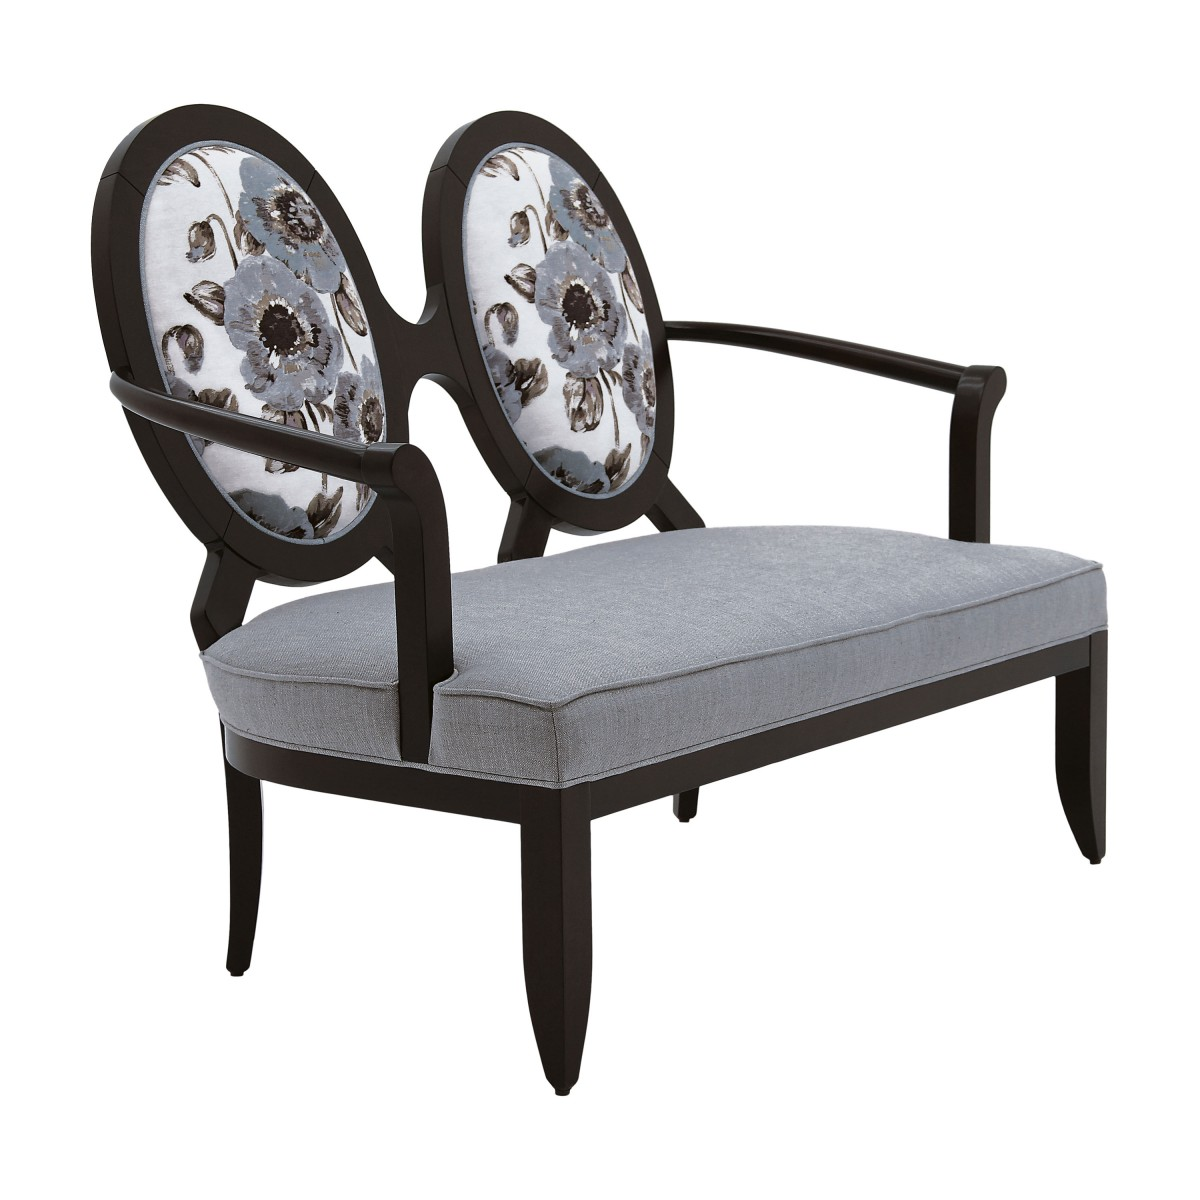 2 Seater sofa Anello - Sevensedie